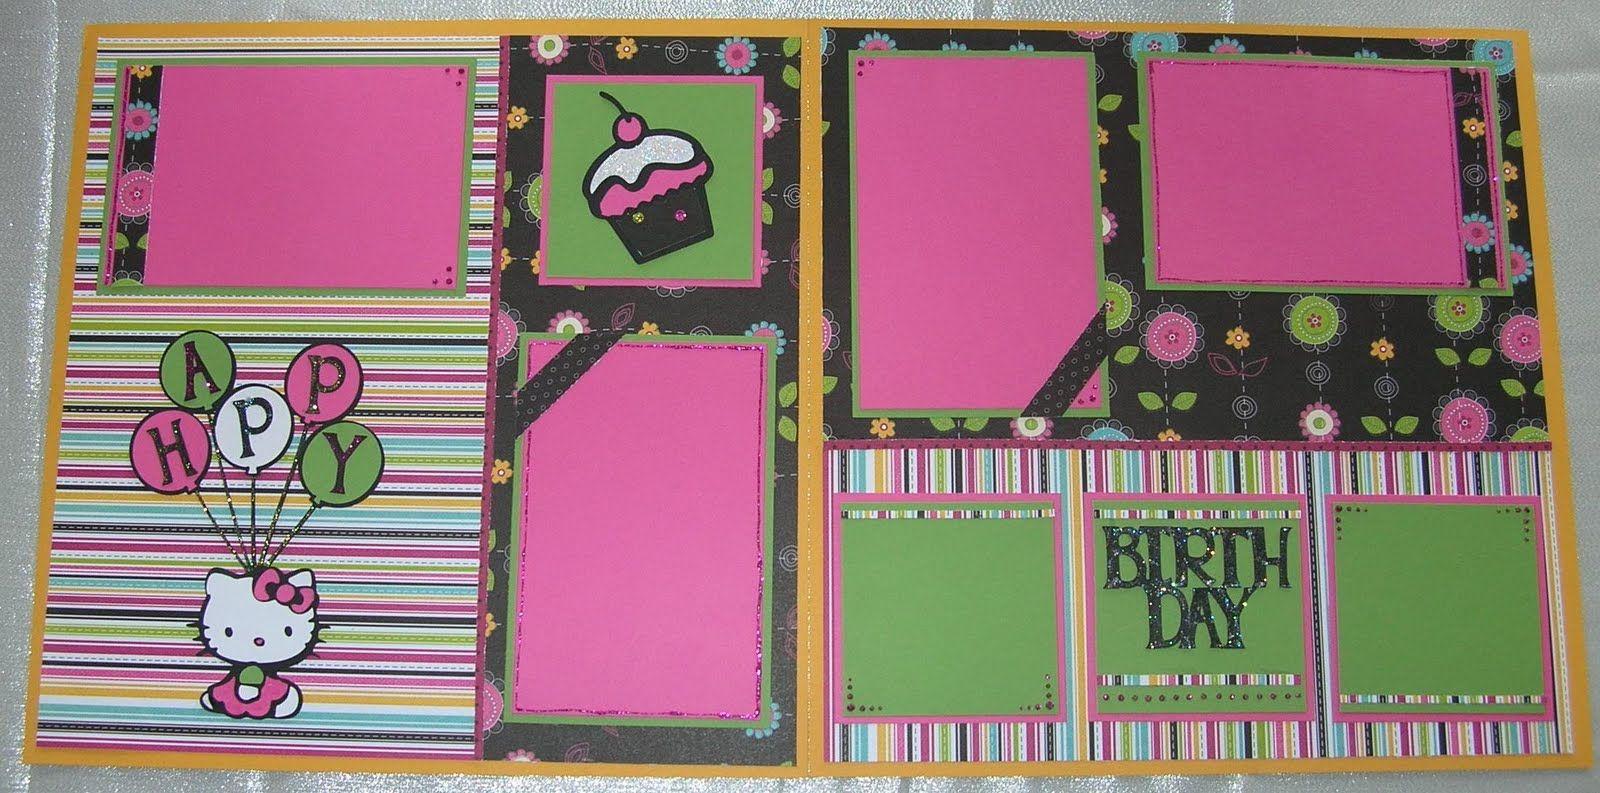 Scrapbook ideas hello kitty - Cricut Ideas Bee S Creative Designs New Hello Kitty Cricut Projects